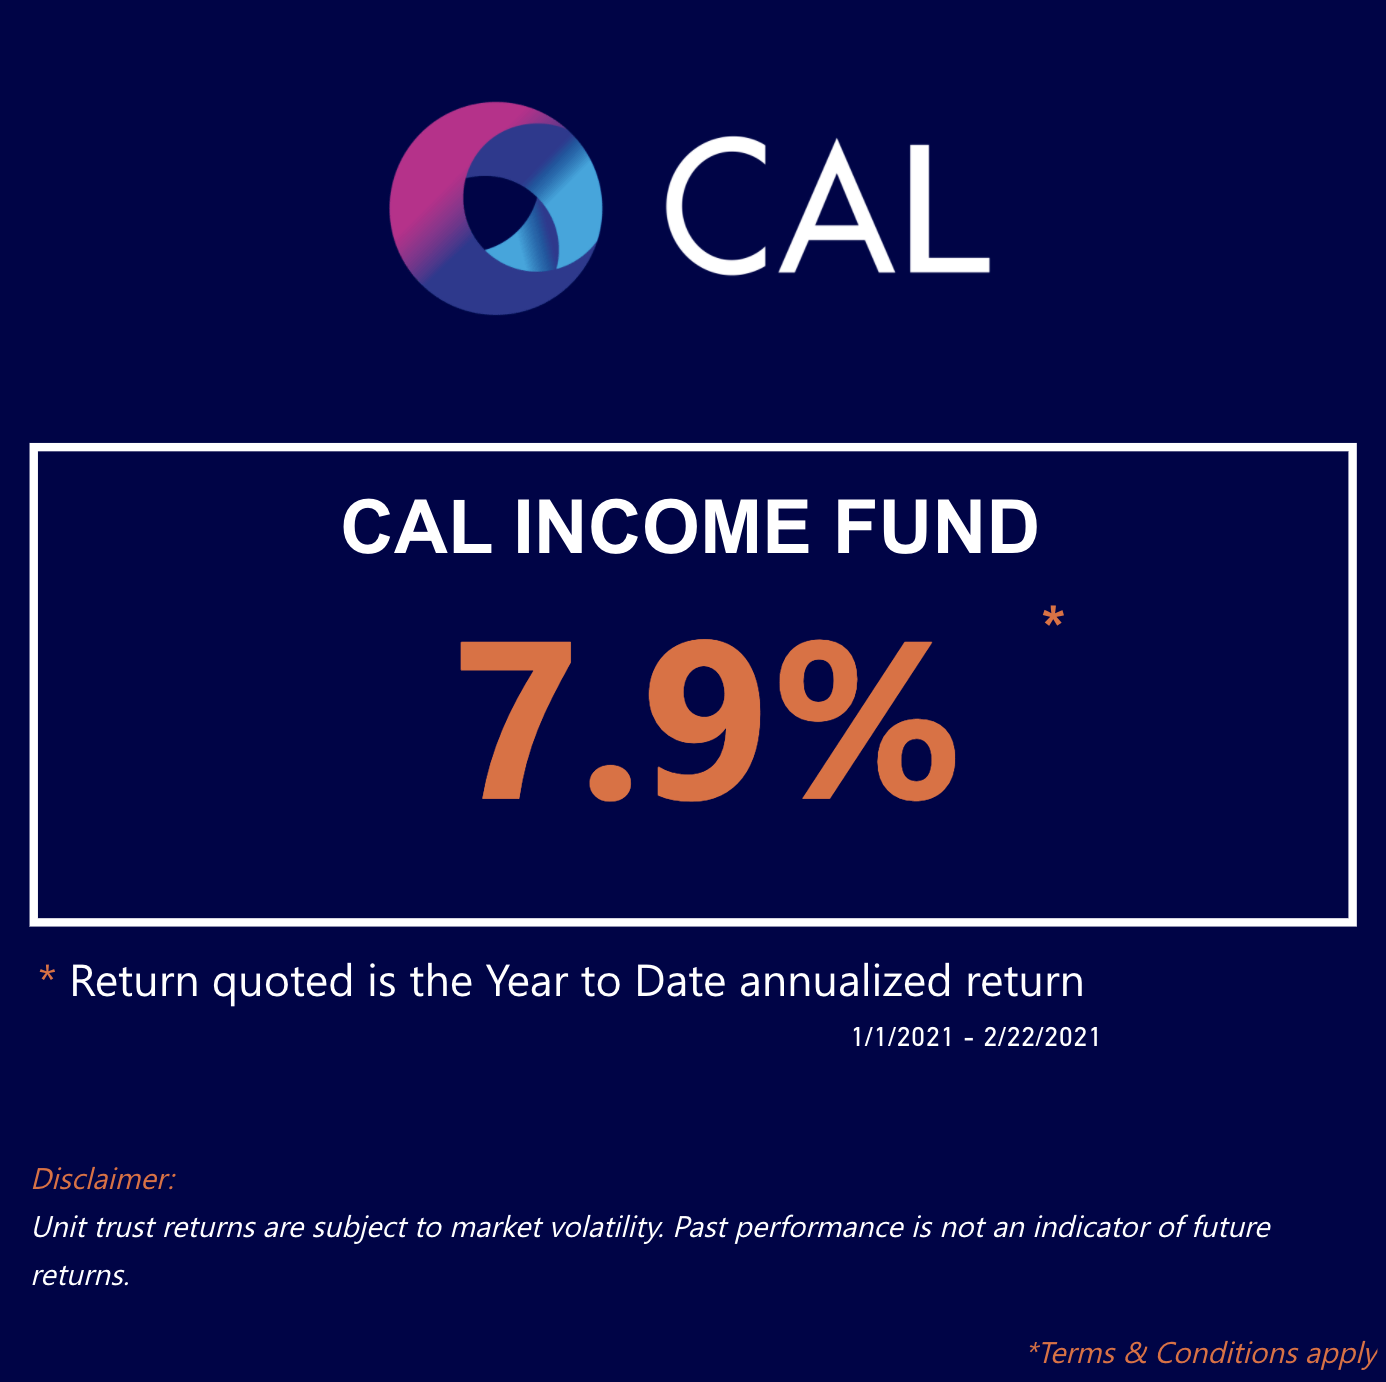 cal income fund